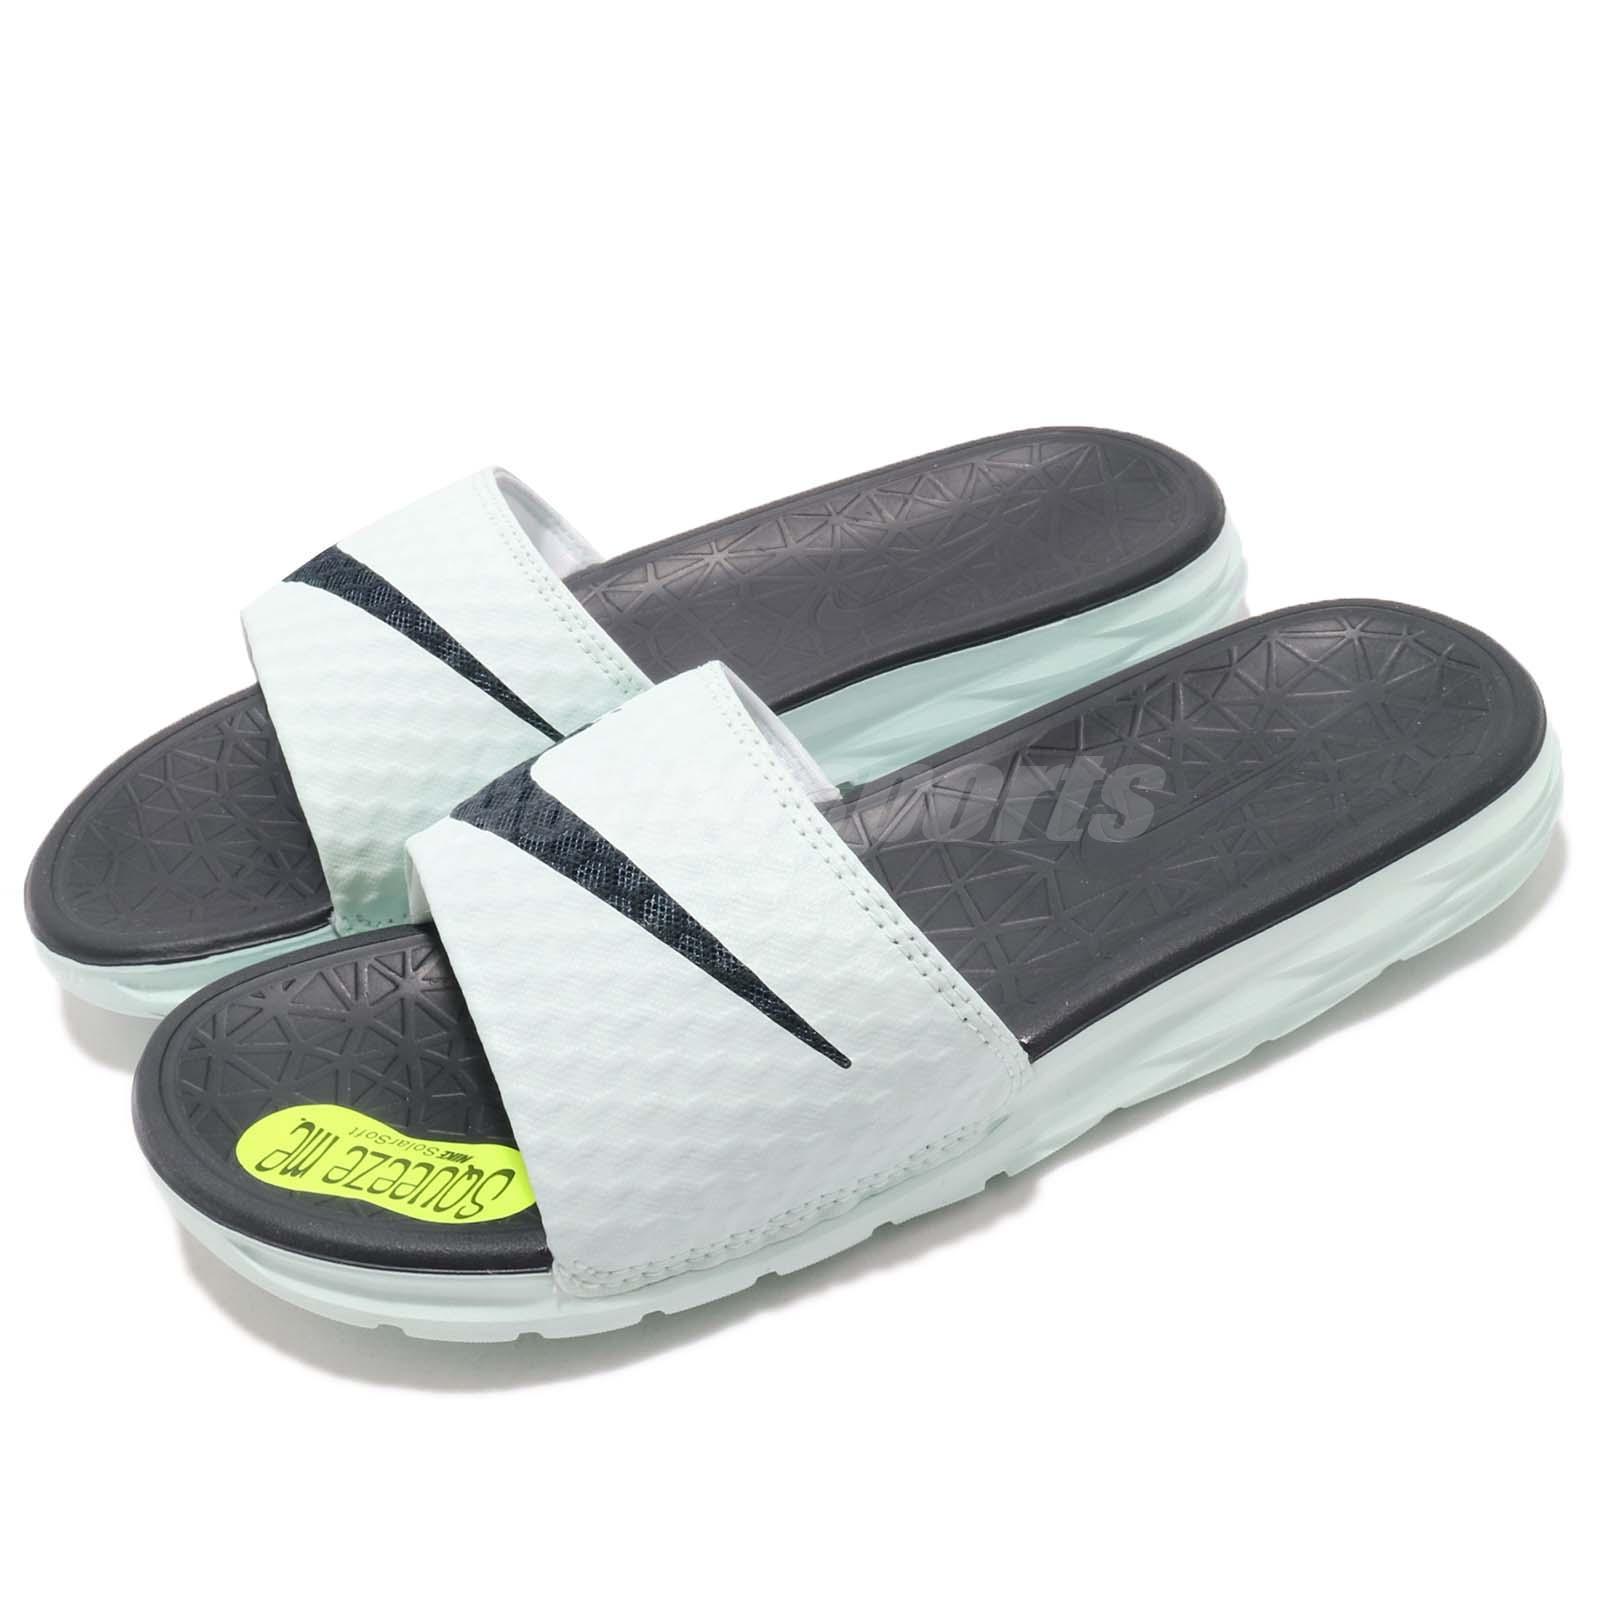 4f512f438 Details about Nike Wmns Benassi Solarsoft Igloo Obsidian Women Sports Sandal  Slides 705475-303